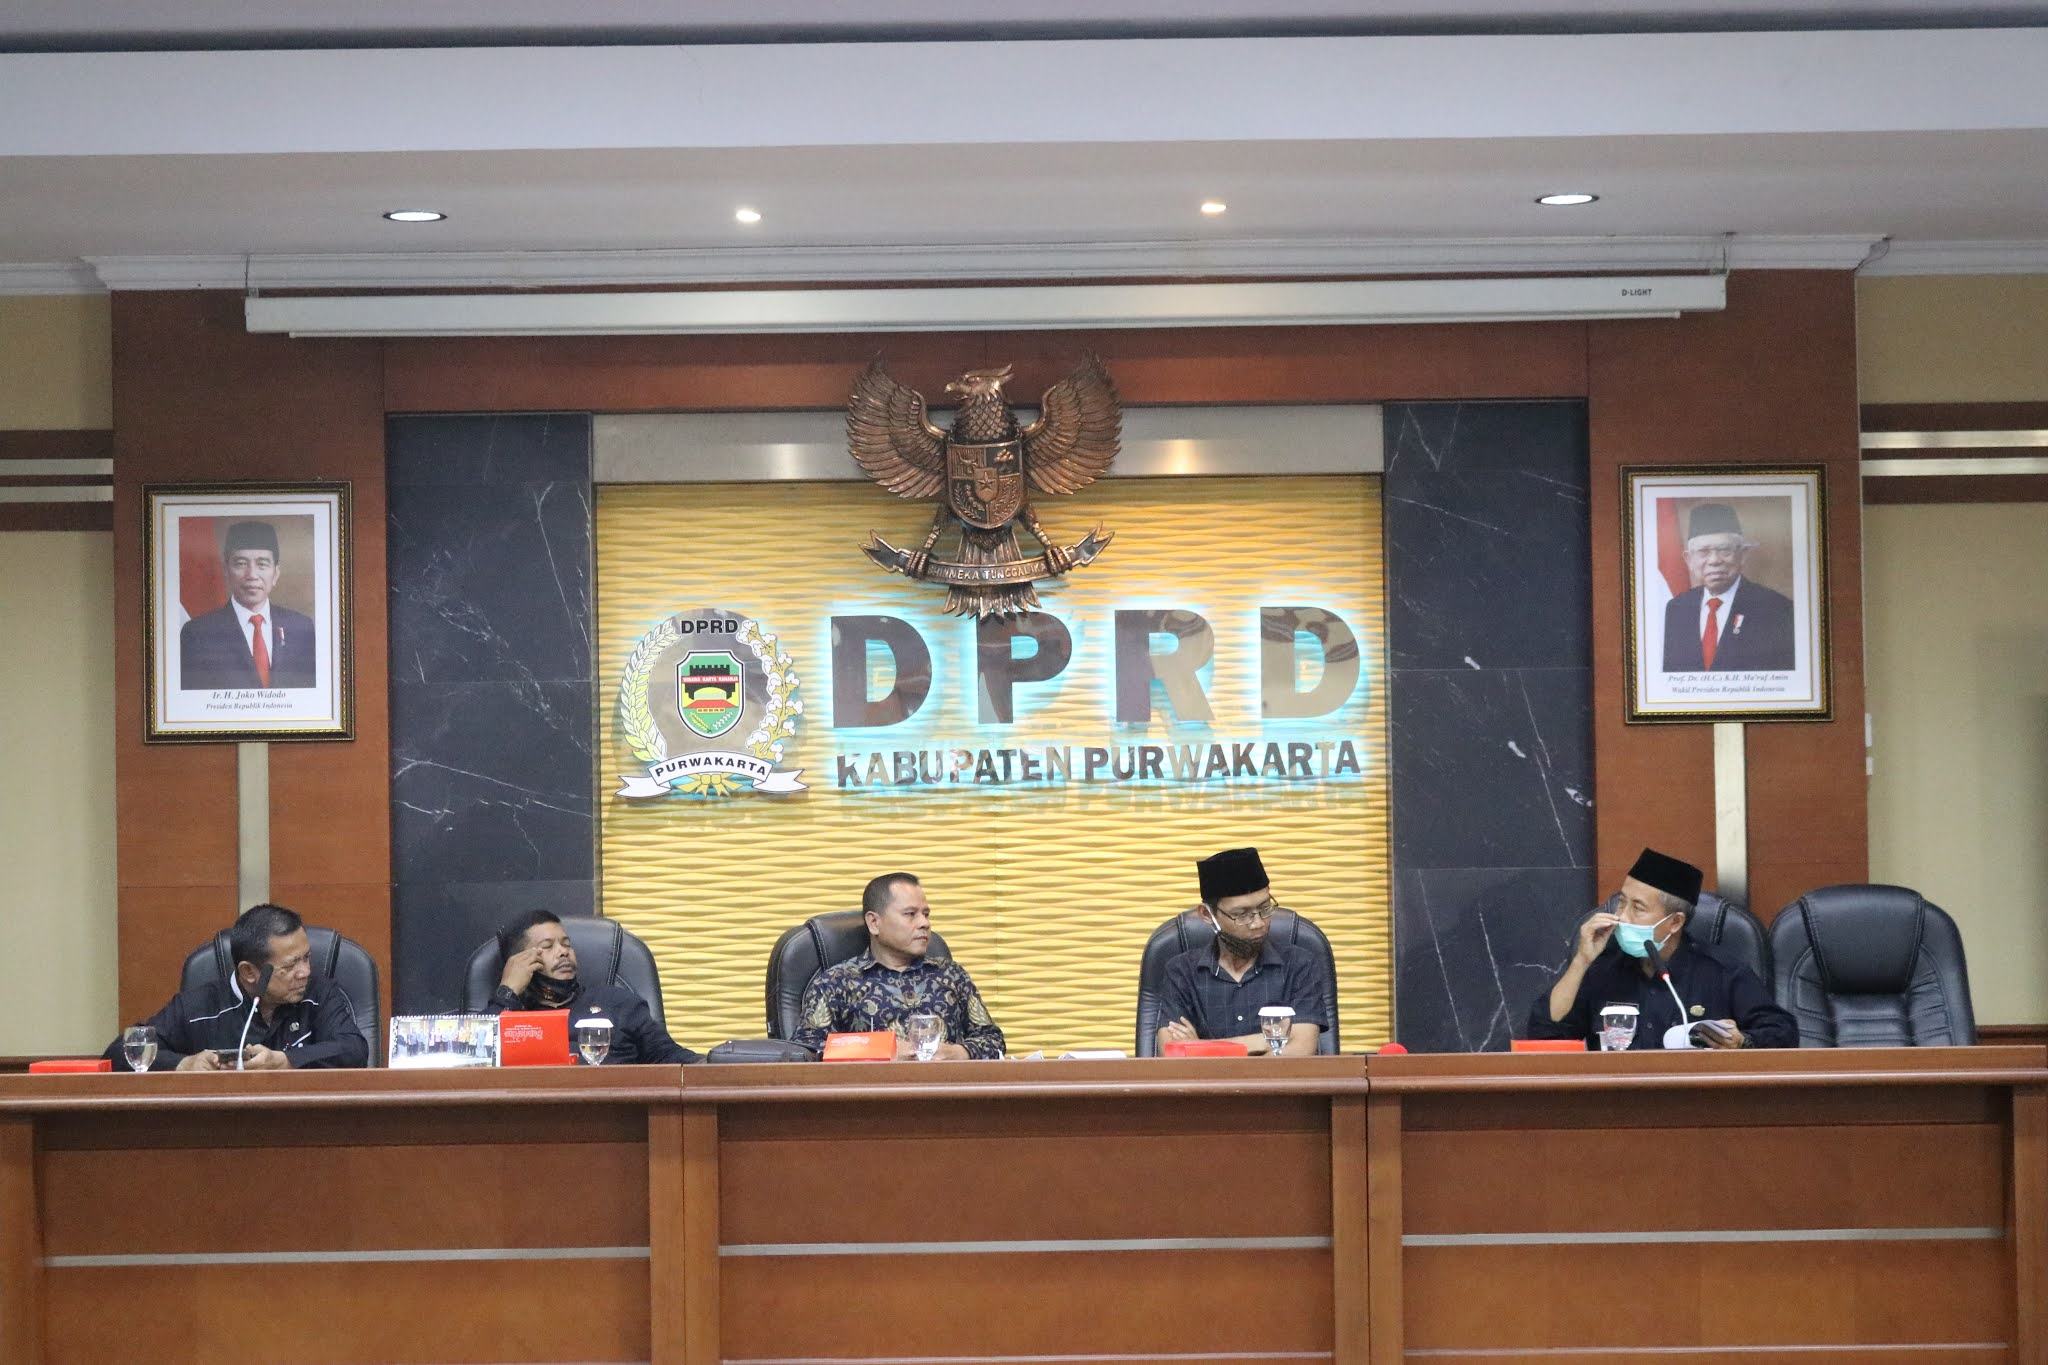 Komisi IV DPRD Fasilitasi, Tiga Hal Tuntutan AGPAII Purwakarta